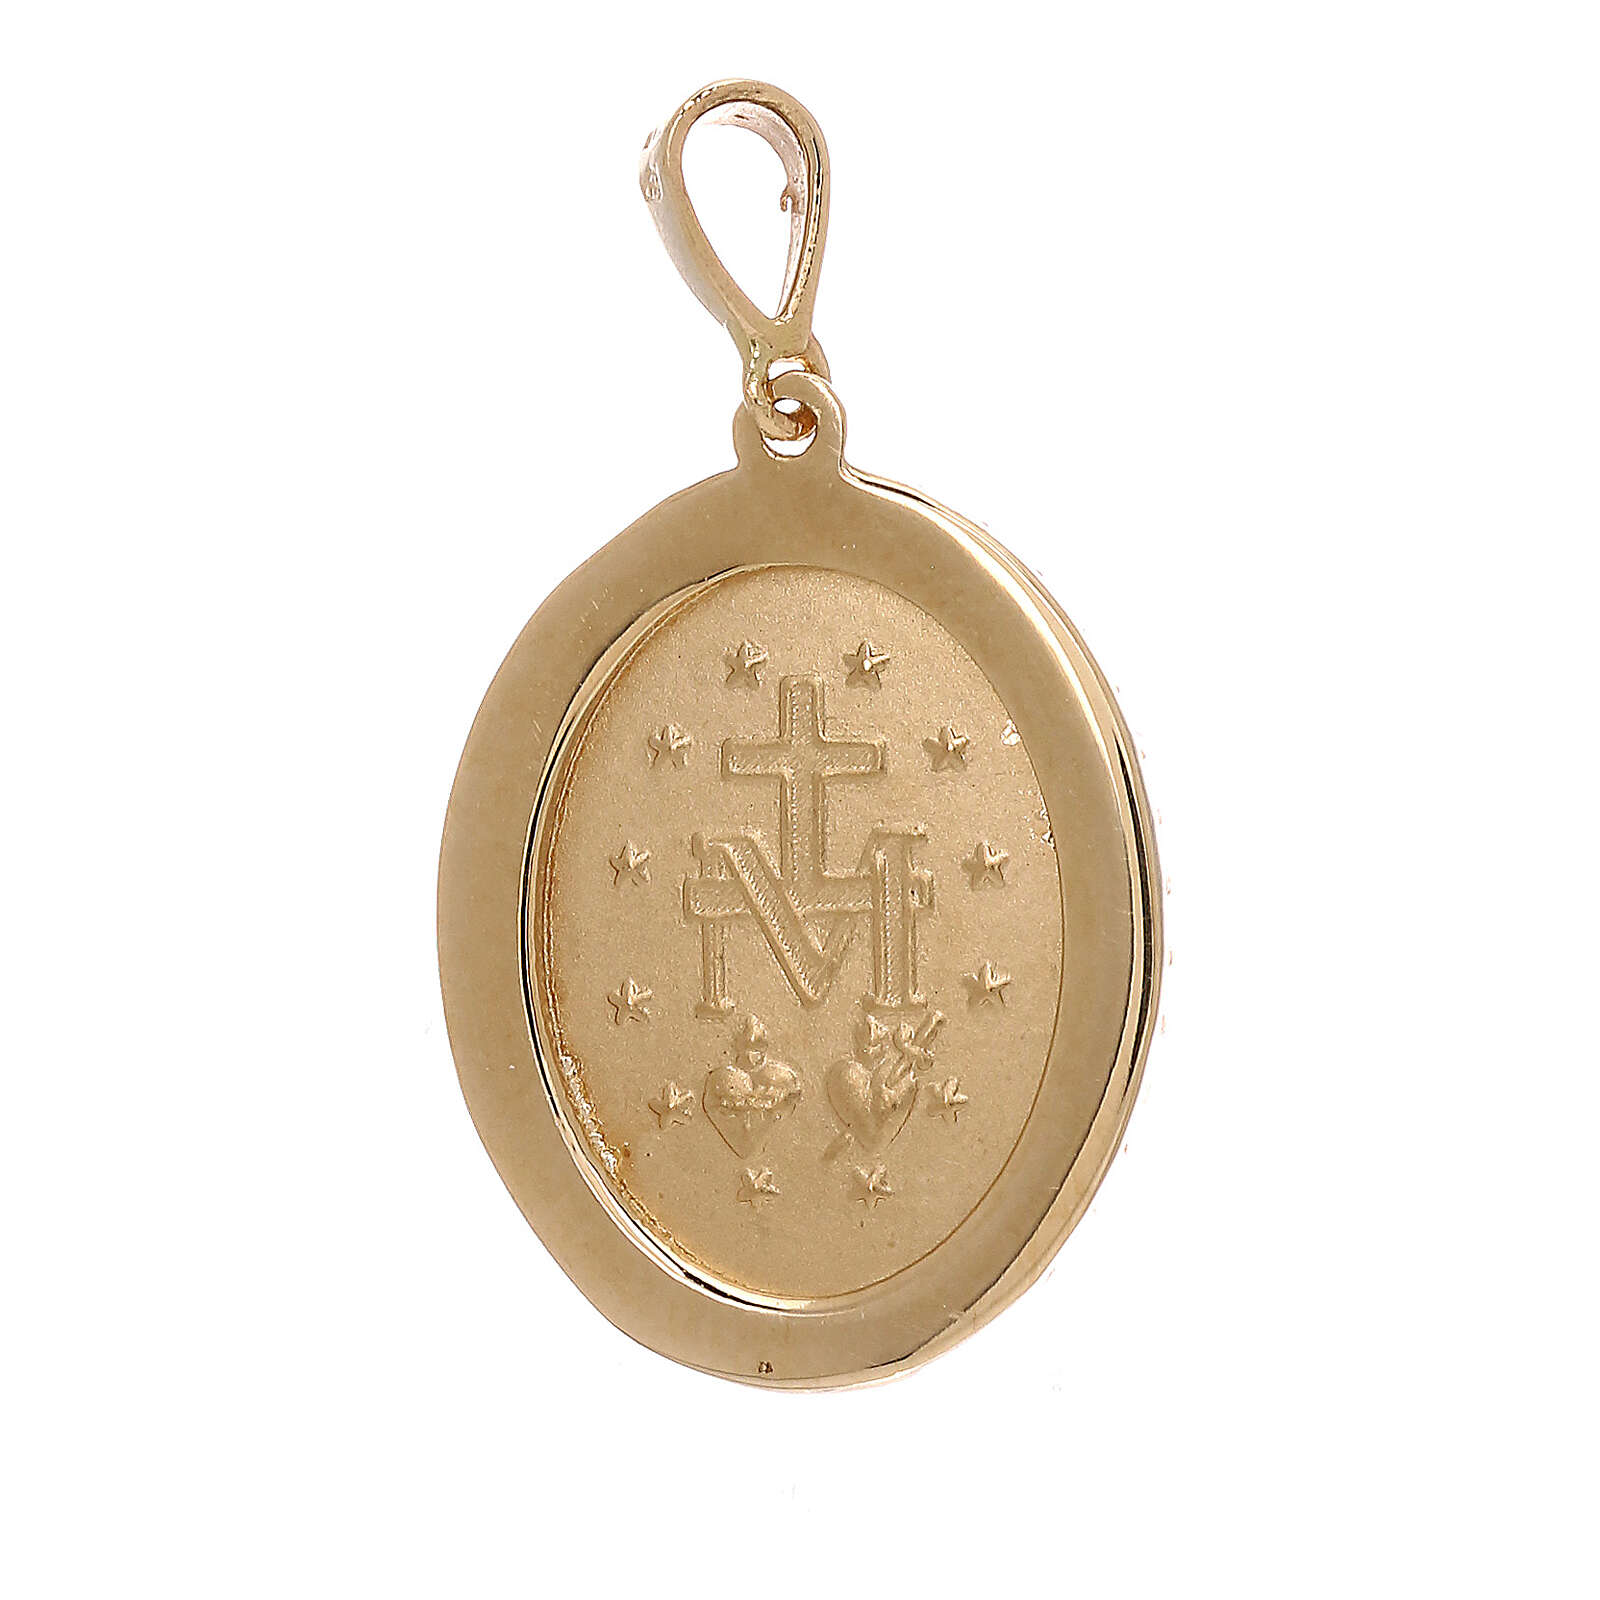 Pendentif Médaille Miraculeuse or jaune 18K Swarovski 3,4 gr 4